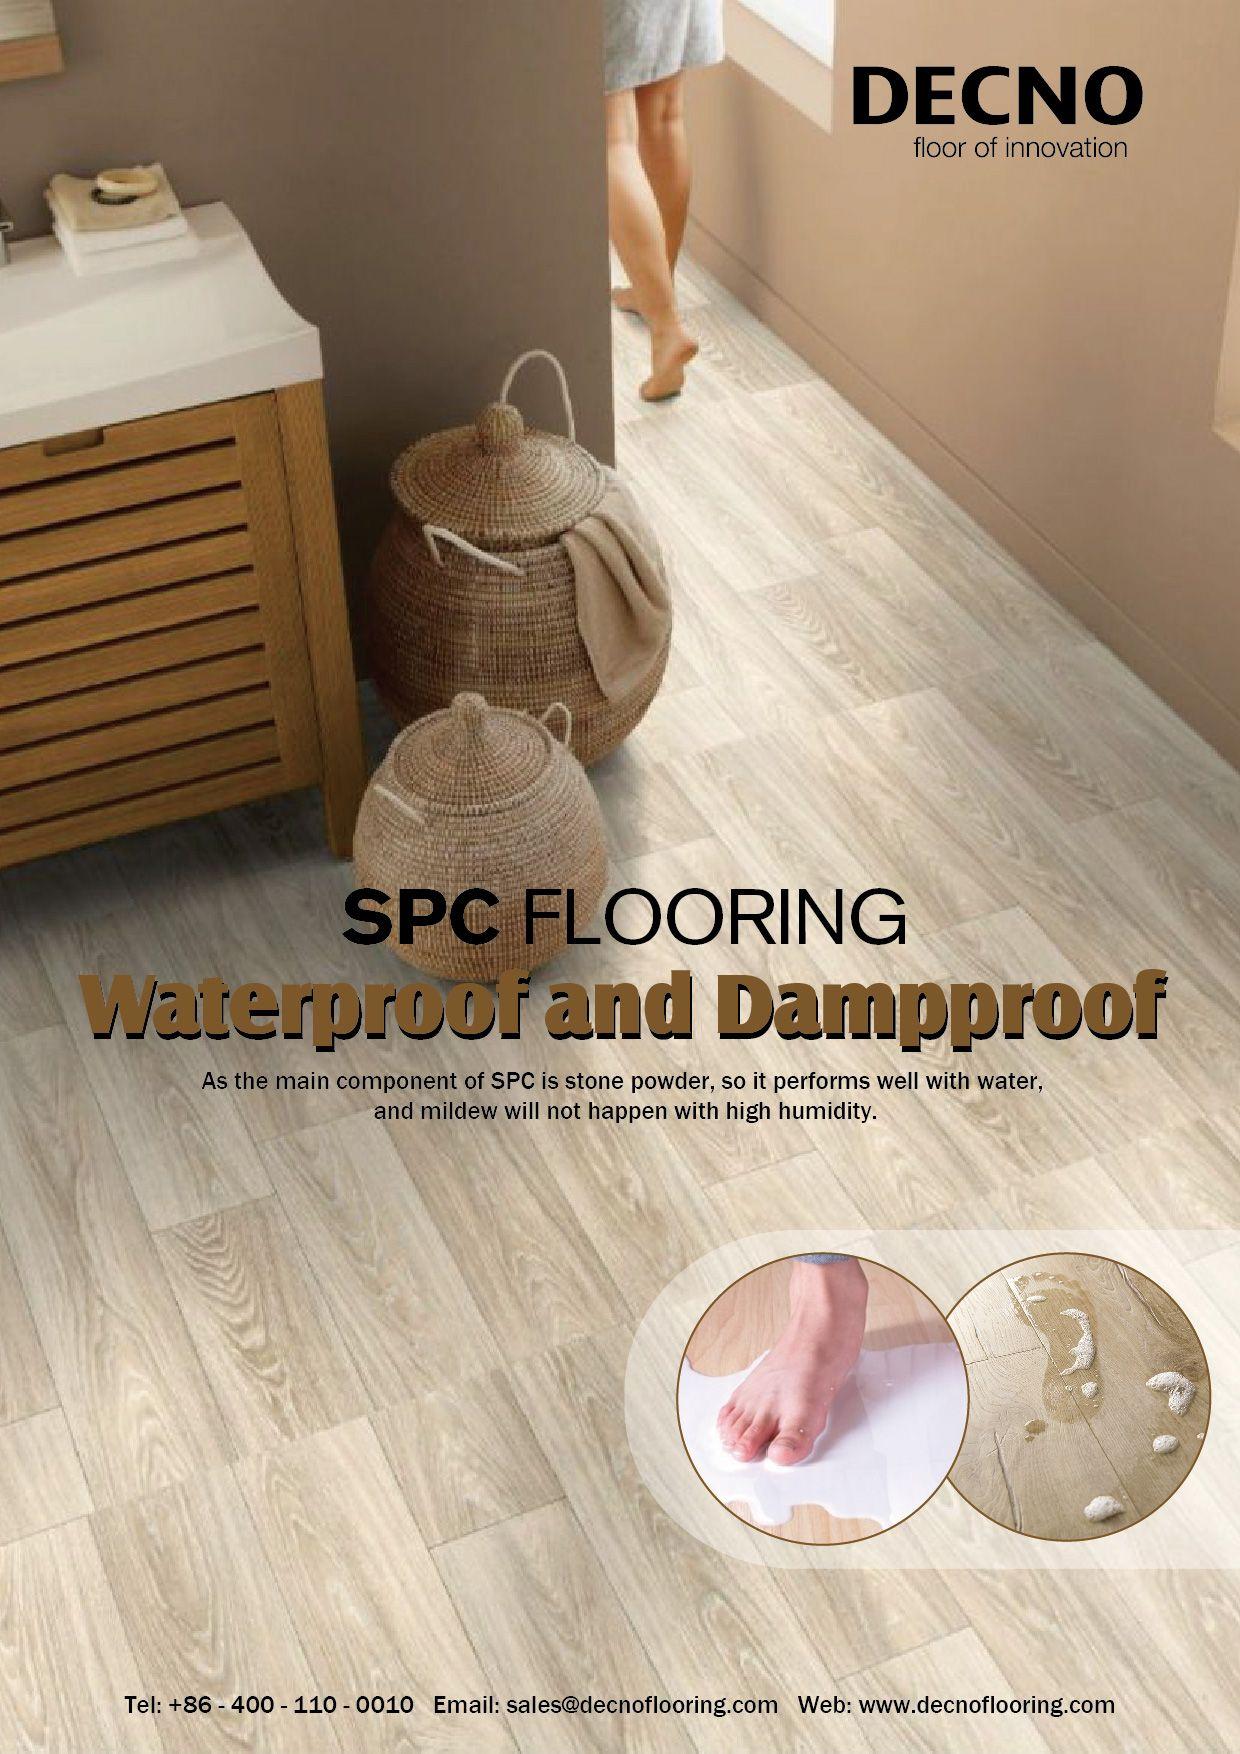 Spc Flooring Stands For Stone Plastic Composite And Decno S Spc Floor Is Designed To Exceed The Main Compo Vinyl Flooring Flooring Waterproof Flooring Vinyls